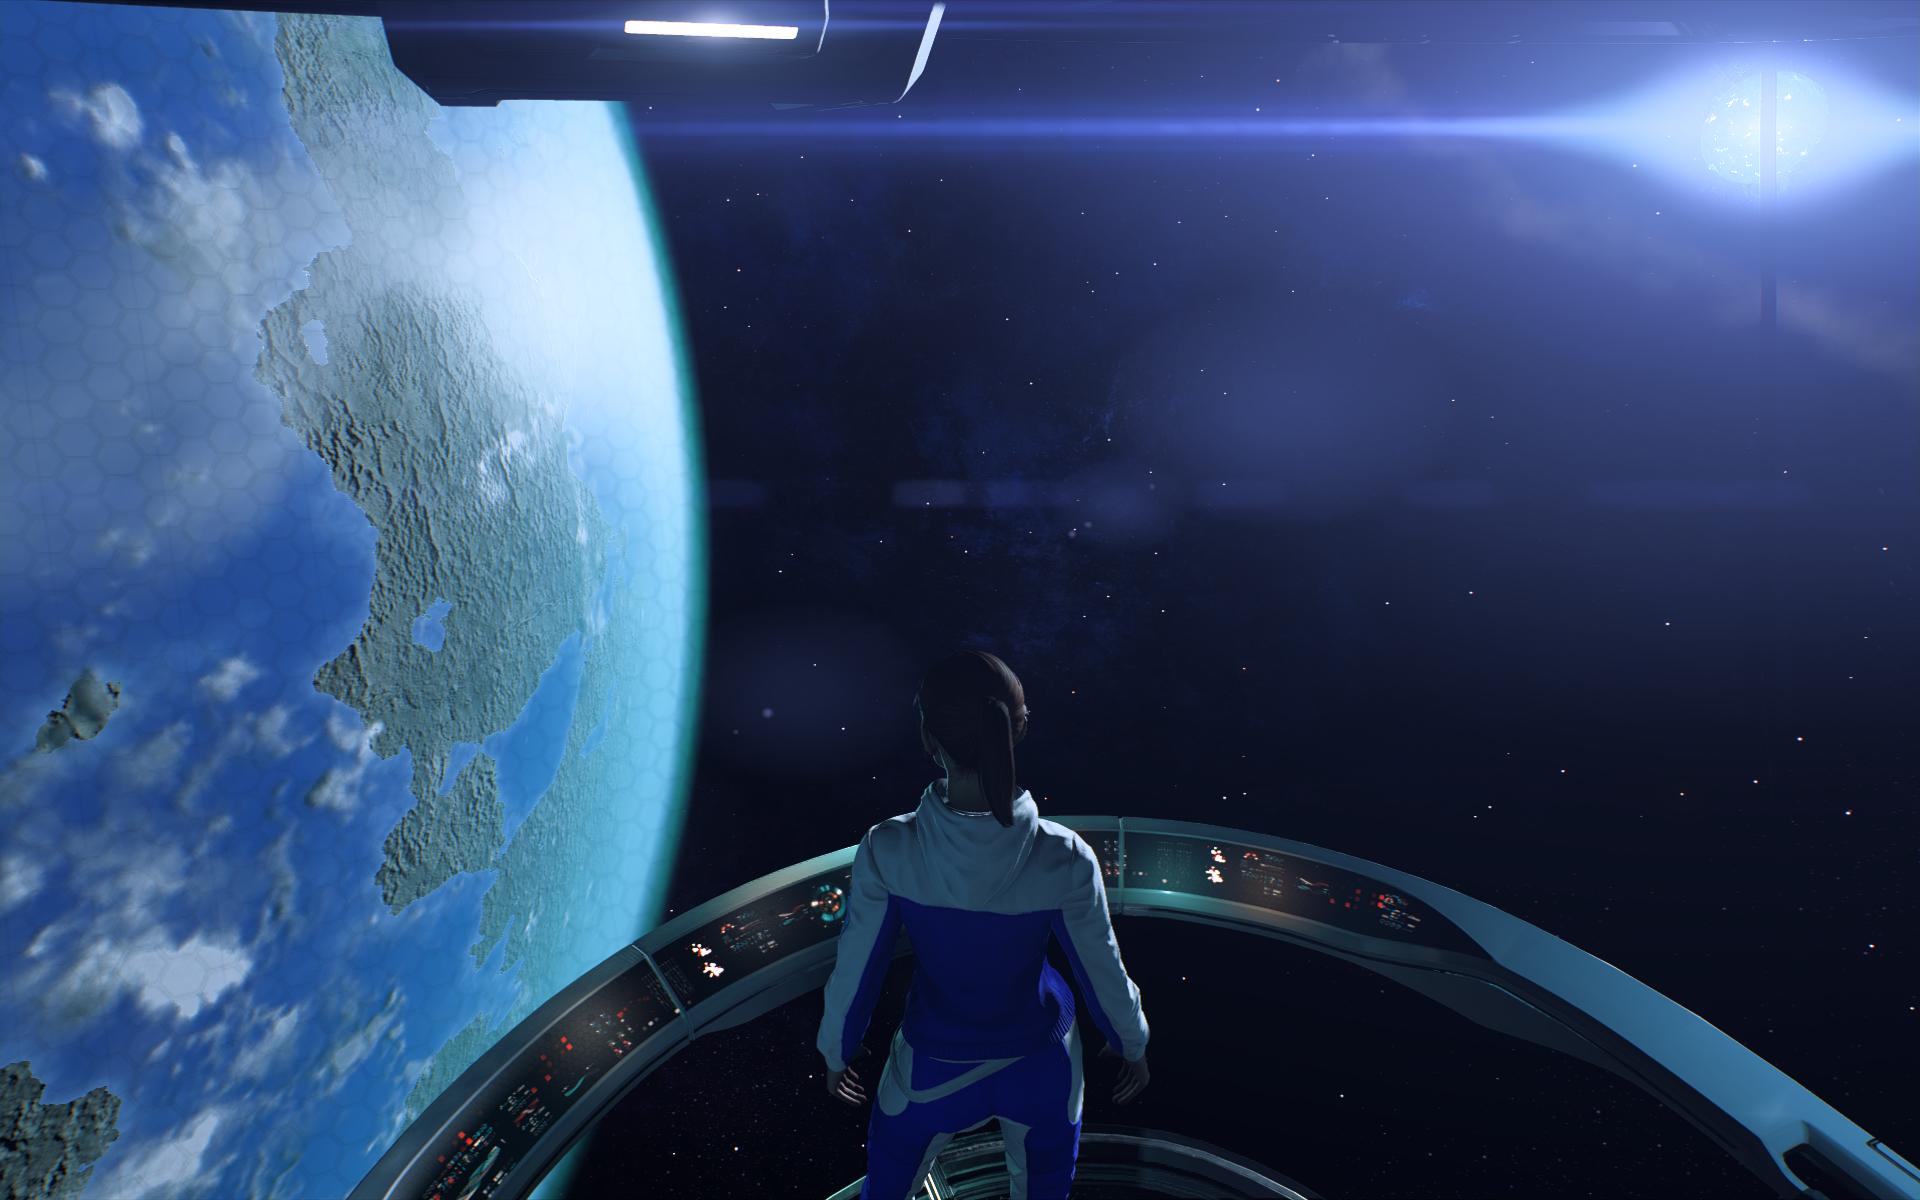 Mass Effect Andromeda Screenshot  - 05.15.16.29.png - Mass Effect: Andromeda